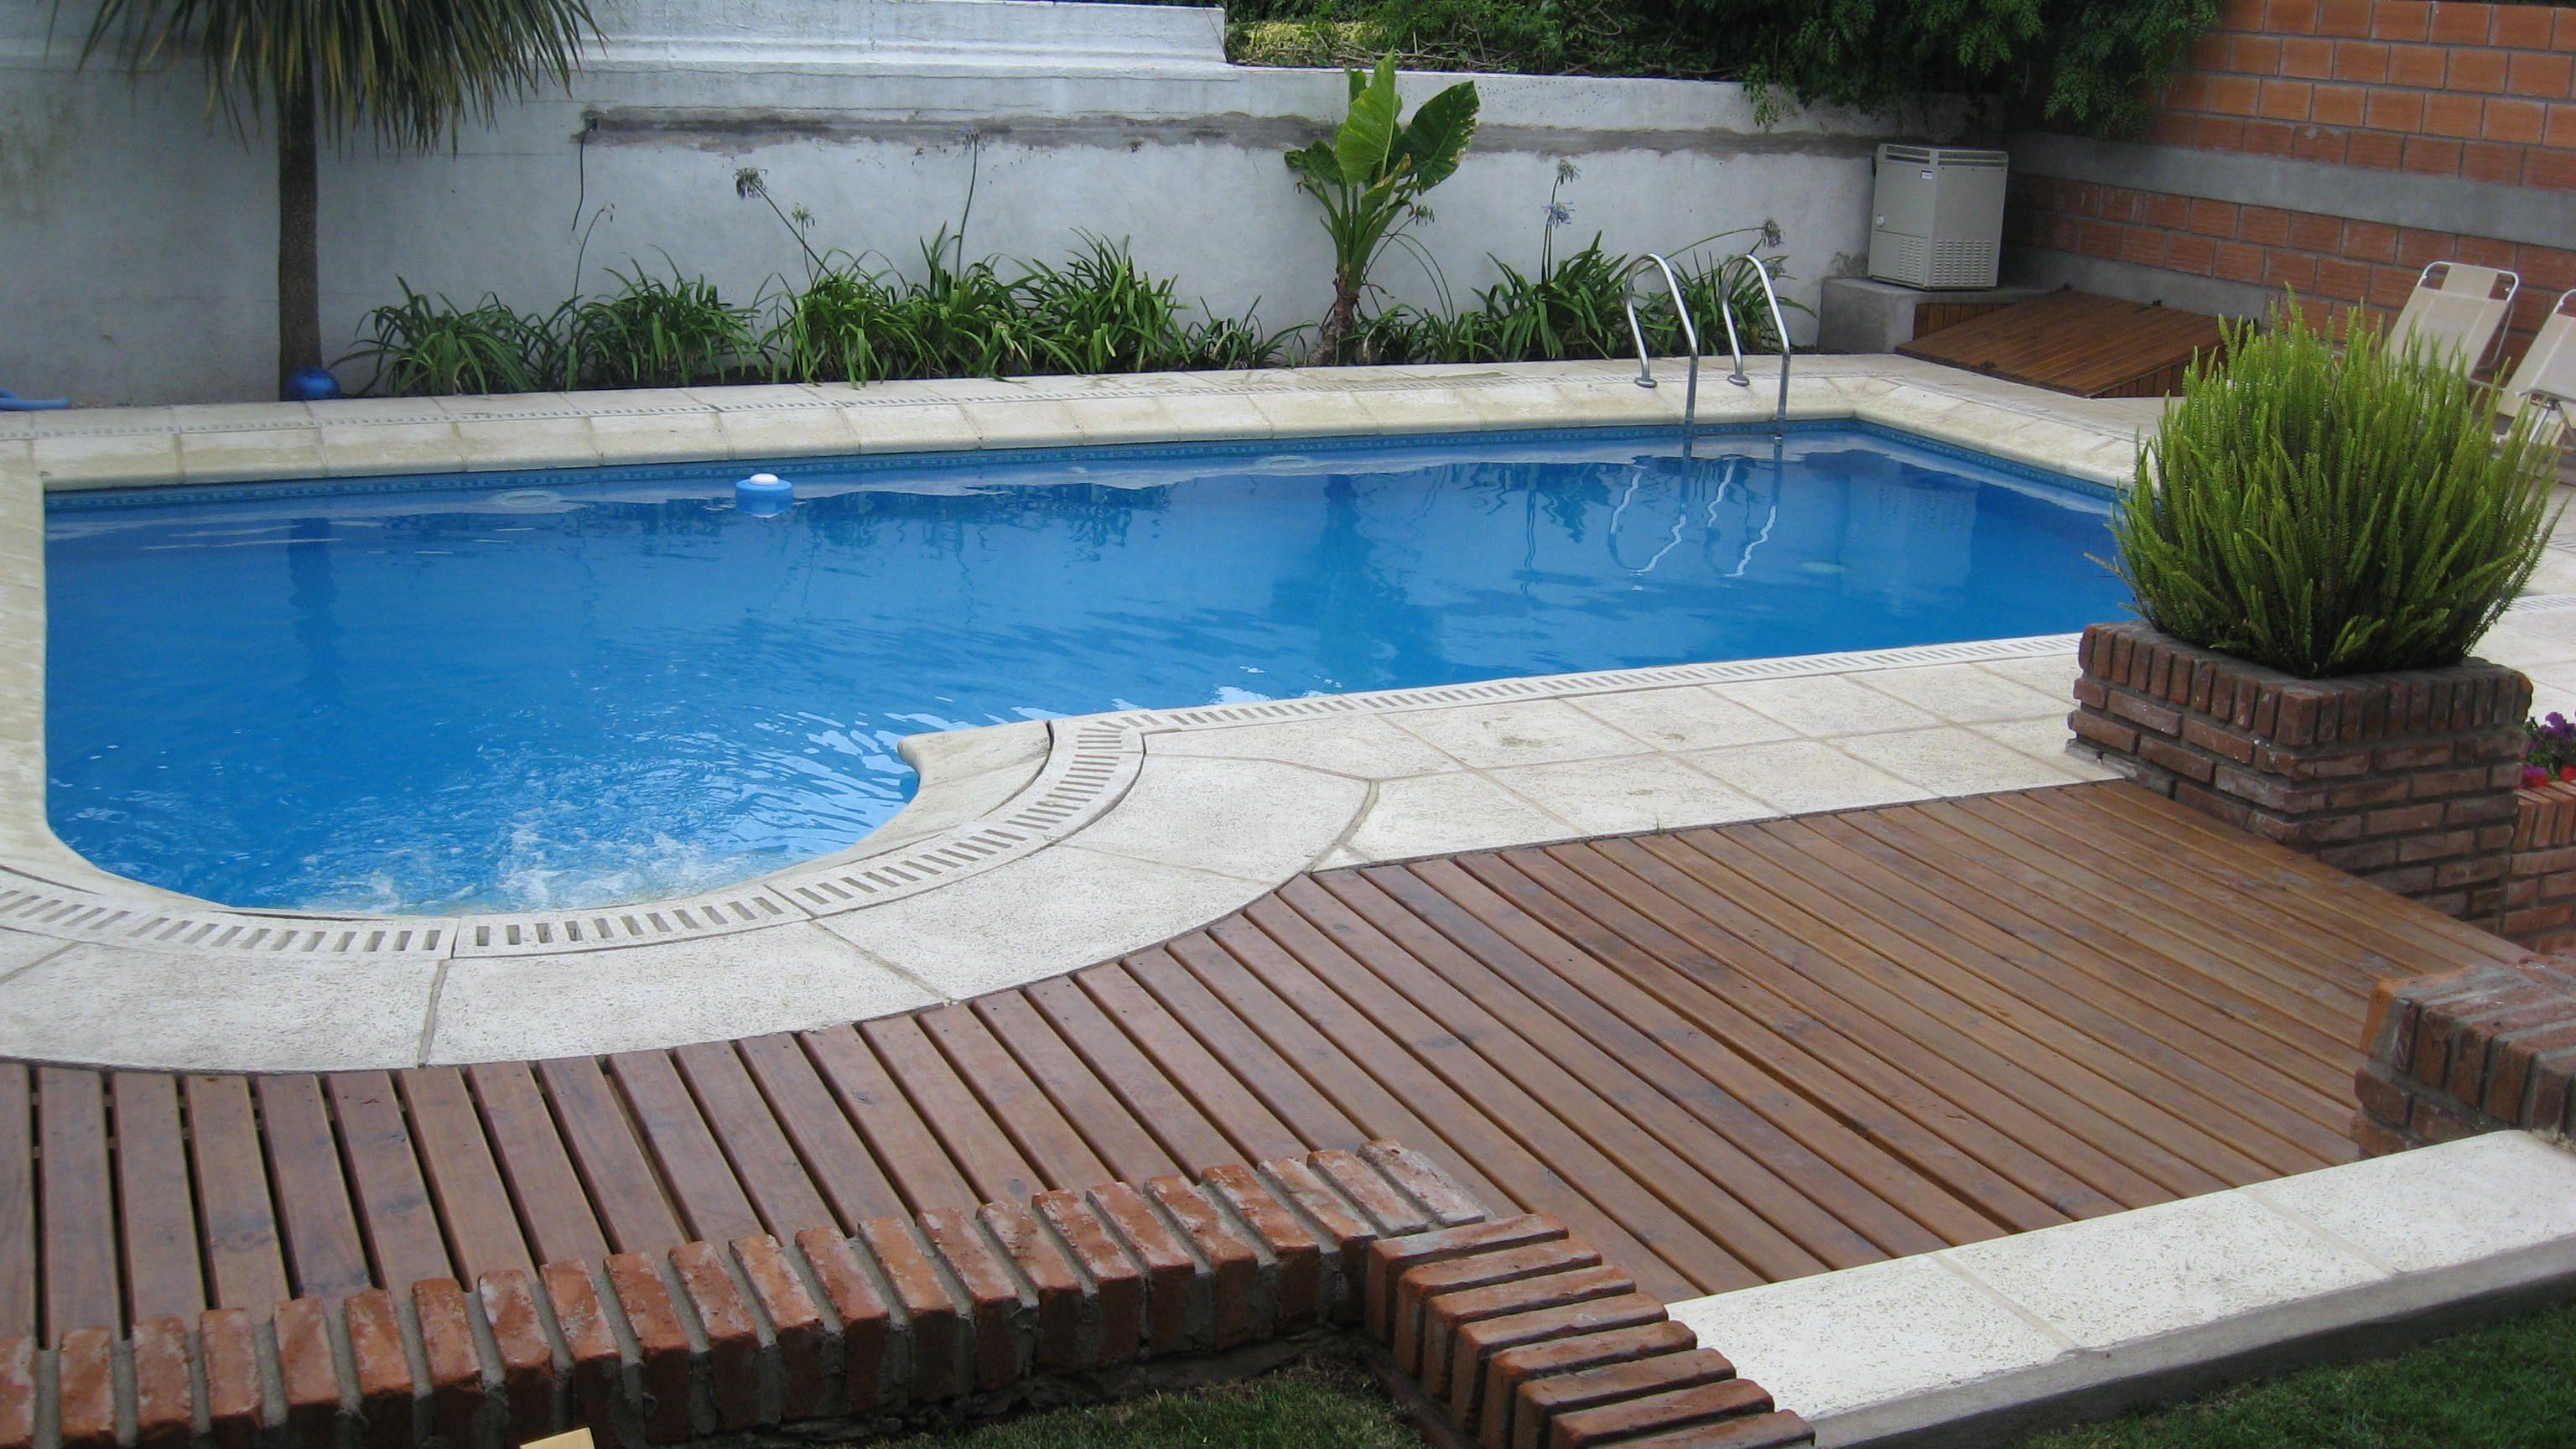 deck de madera y piscina  Piscina con deck  Pinterest